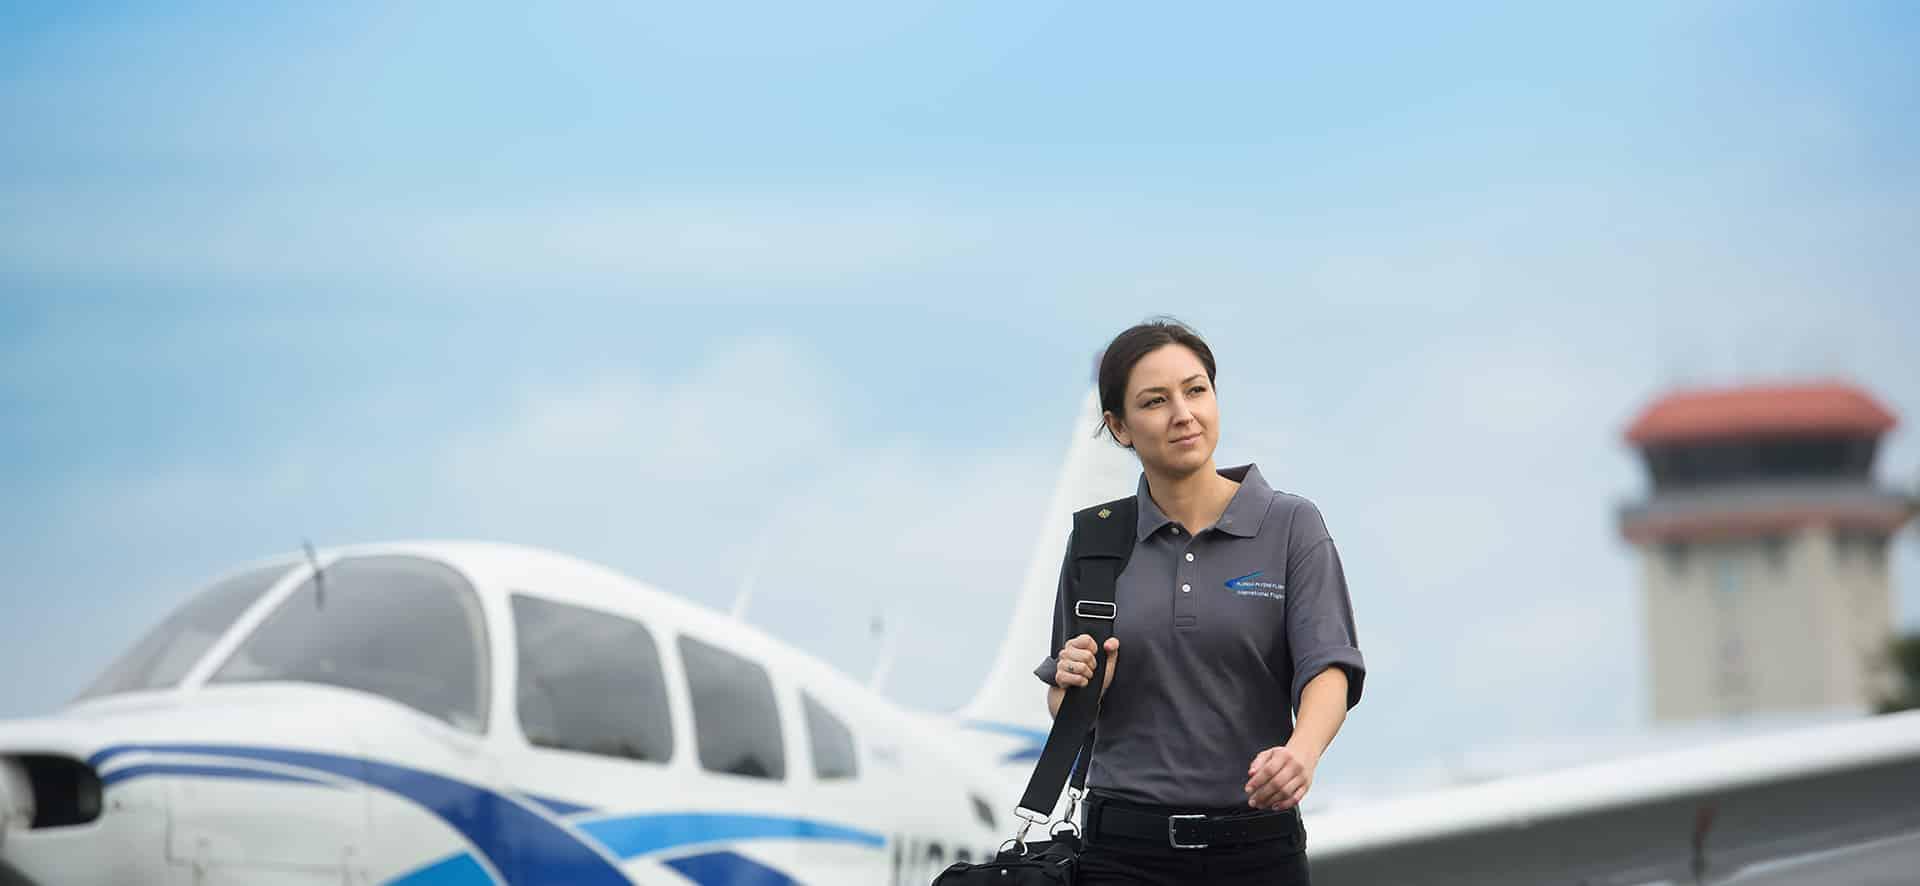 Florida Flyers Flight School